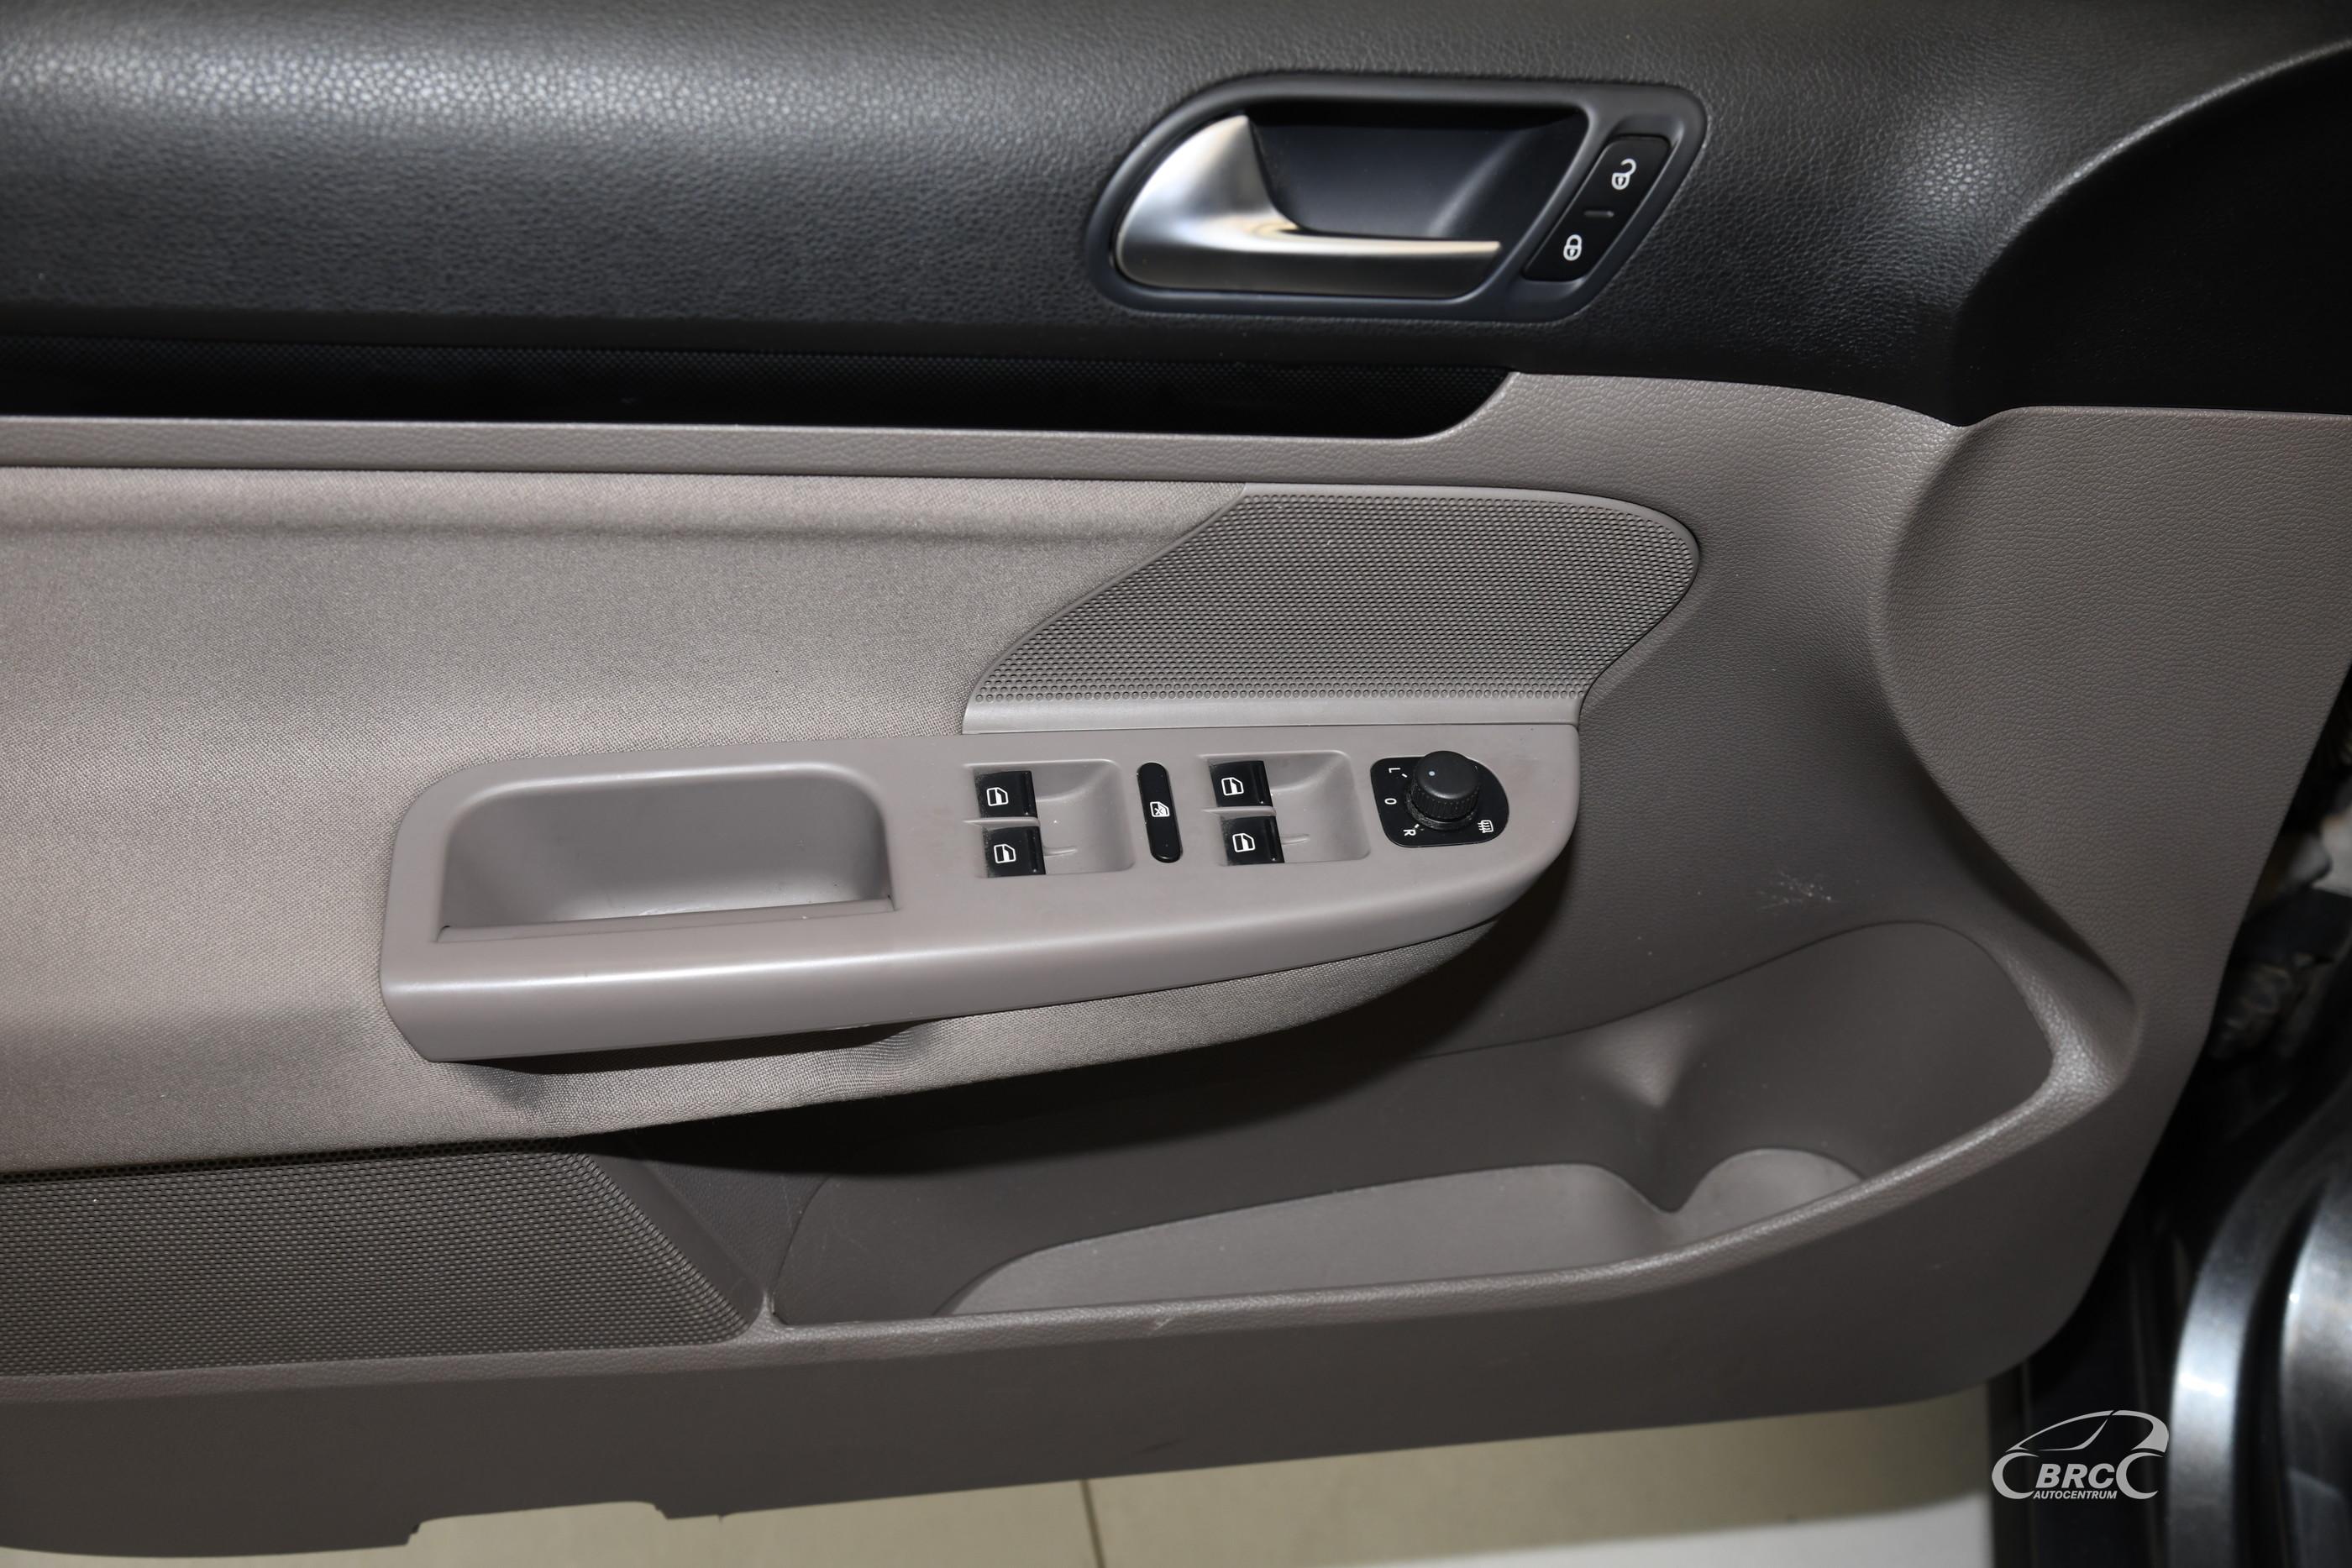 Volkswagen Golf 1.6 TDI Bluemotion Variant Automatas